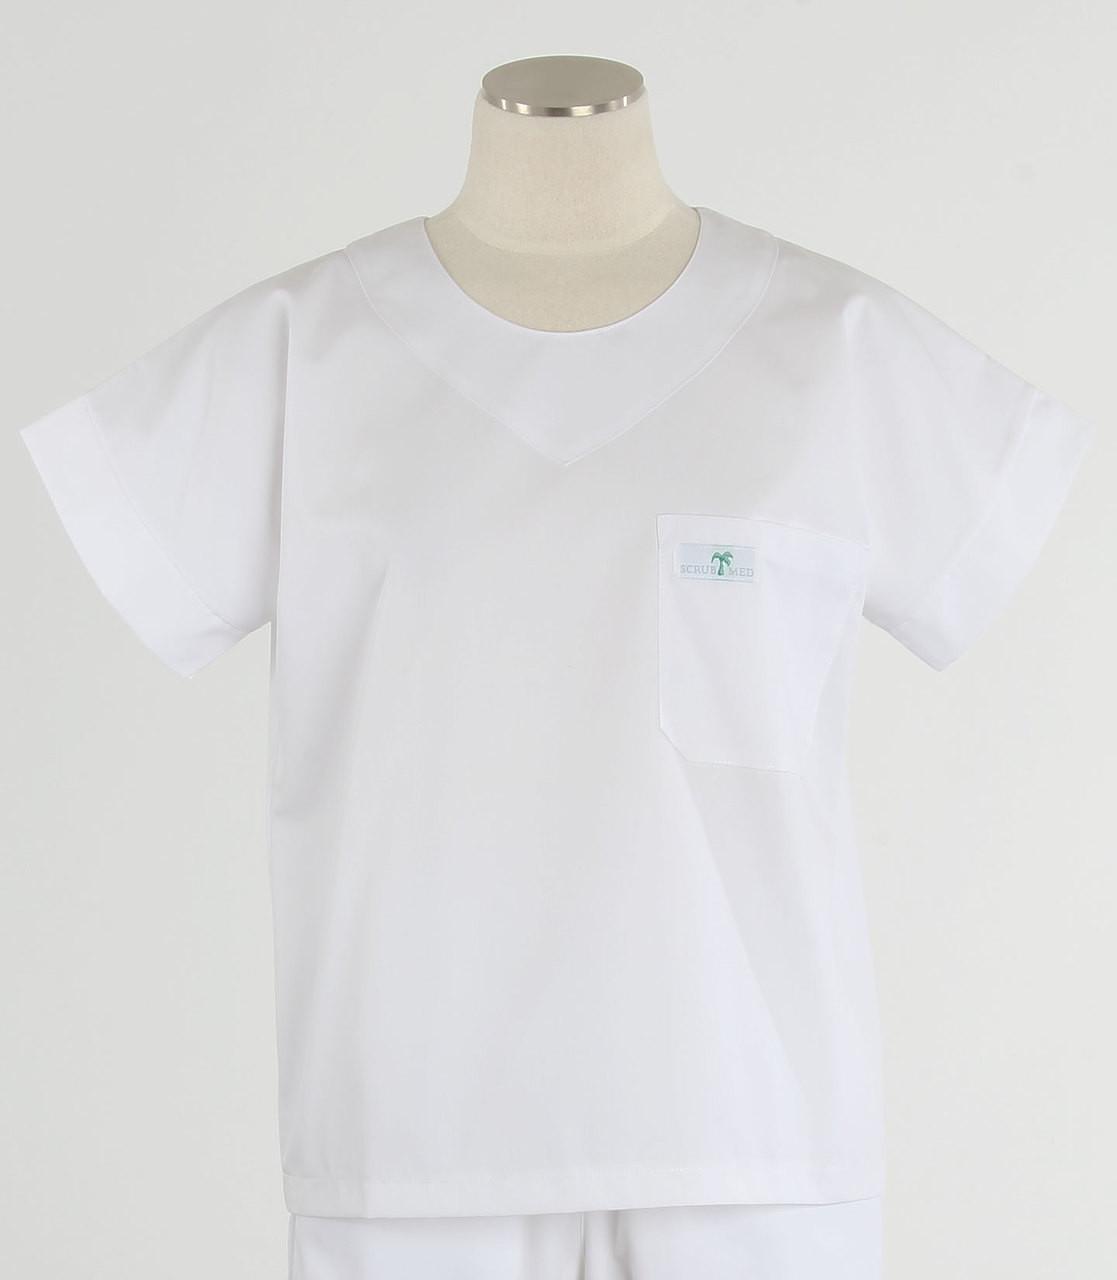 fdea6be624d Scrub Med Womens Solid Scrub Top White - Scrub Med